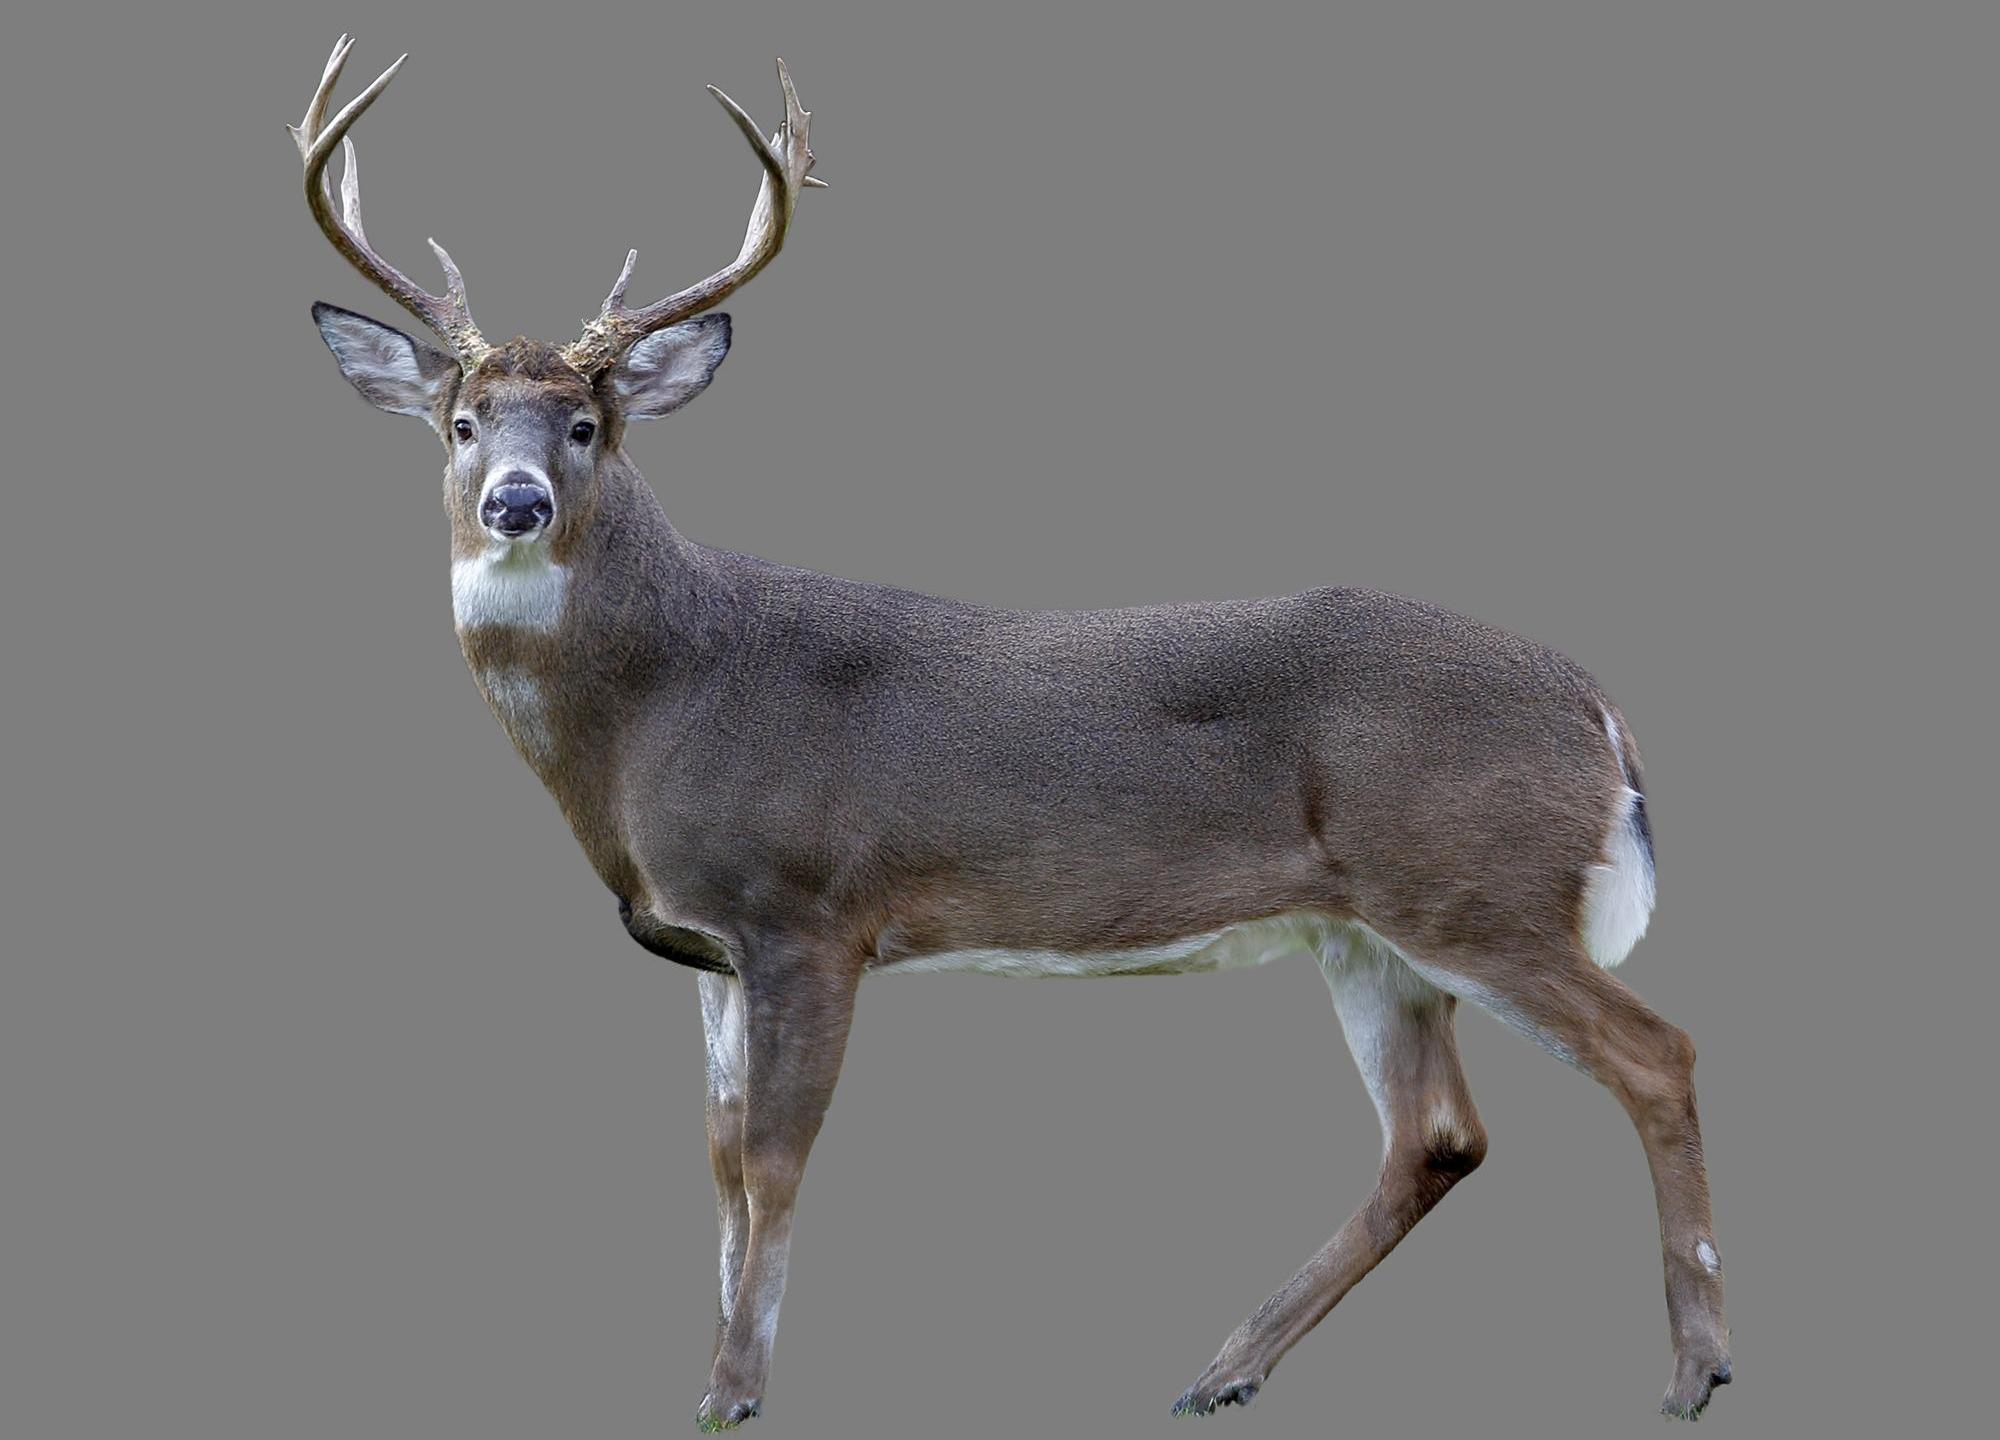 White tail deer_1544896382916.jpg.jpg